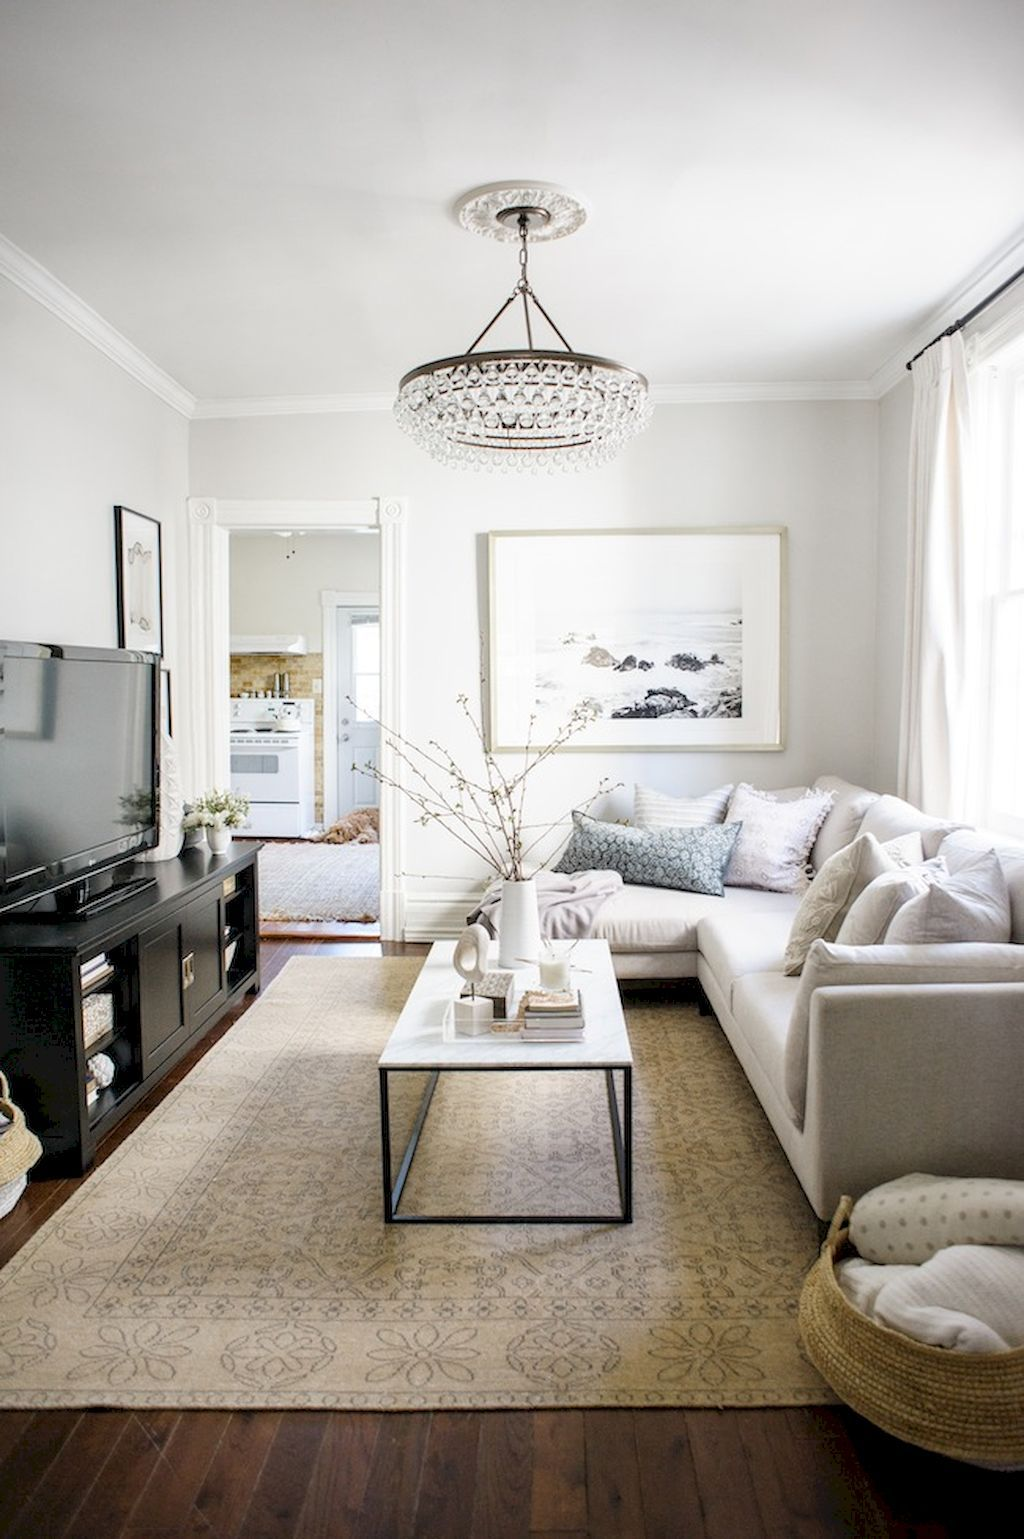 90 Affordable Apartment Organization Ideas | Cozy apartment, Living ...